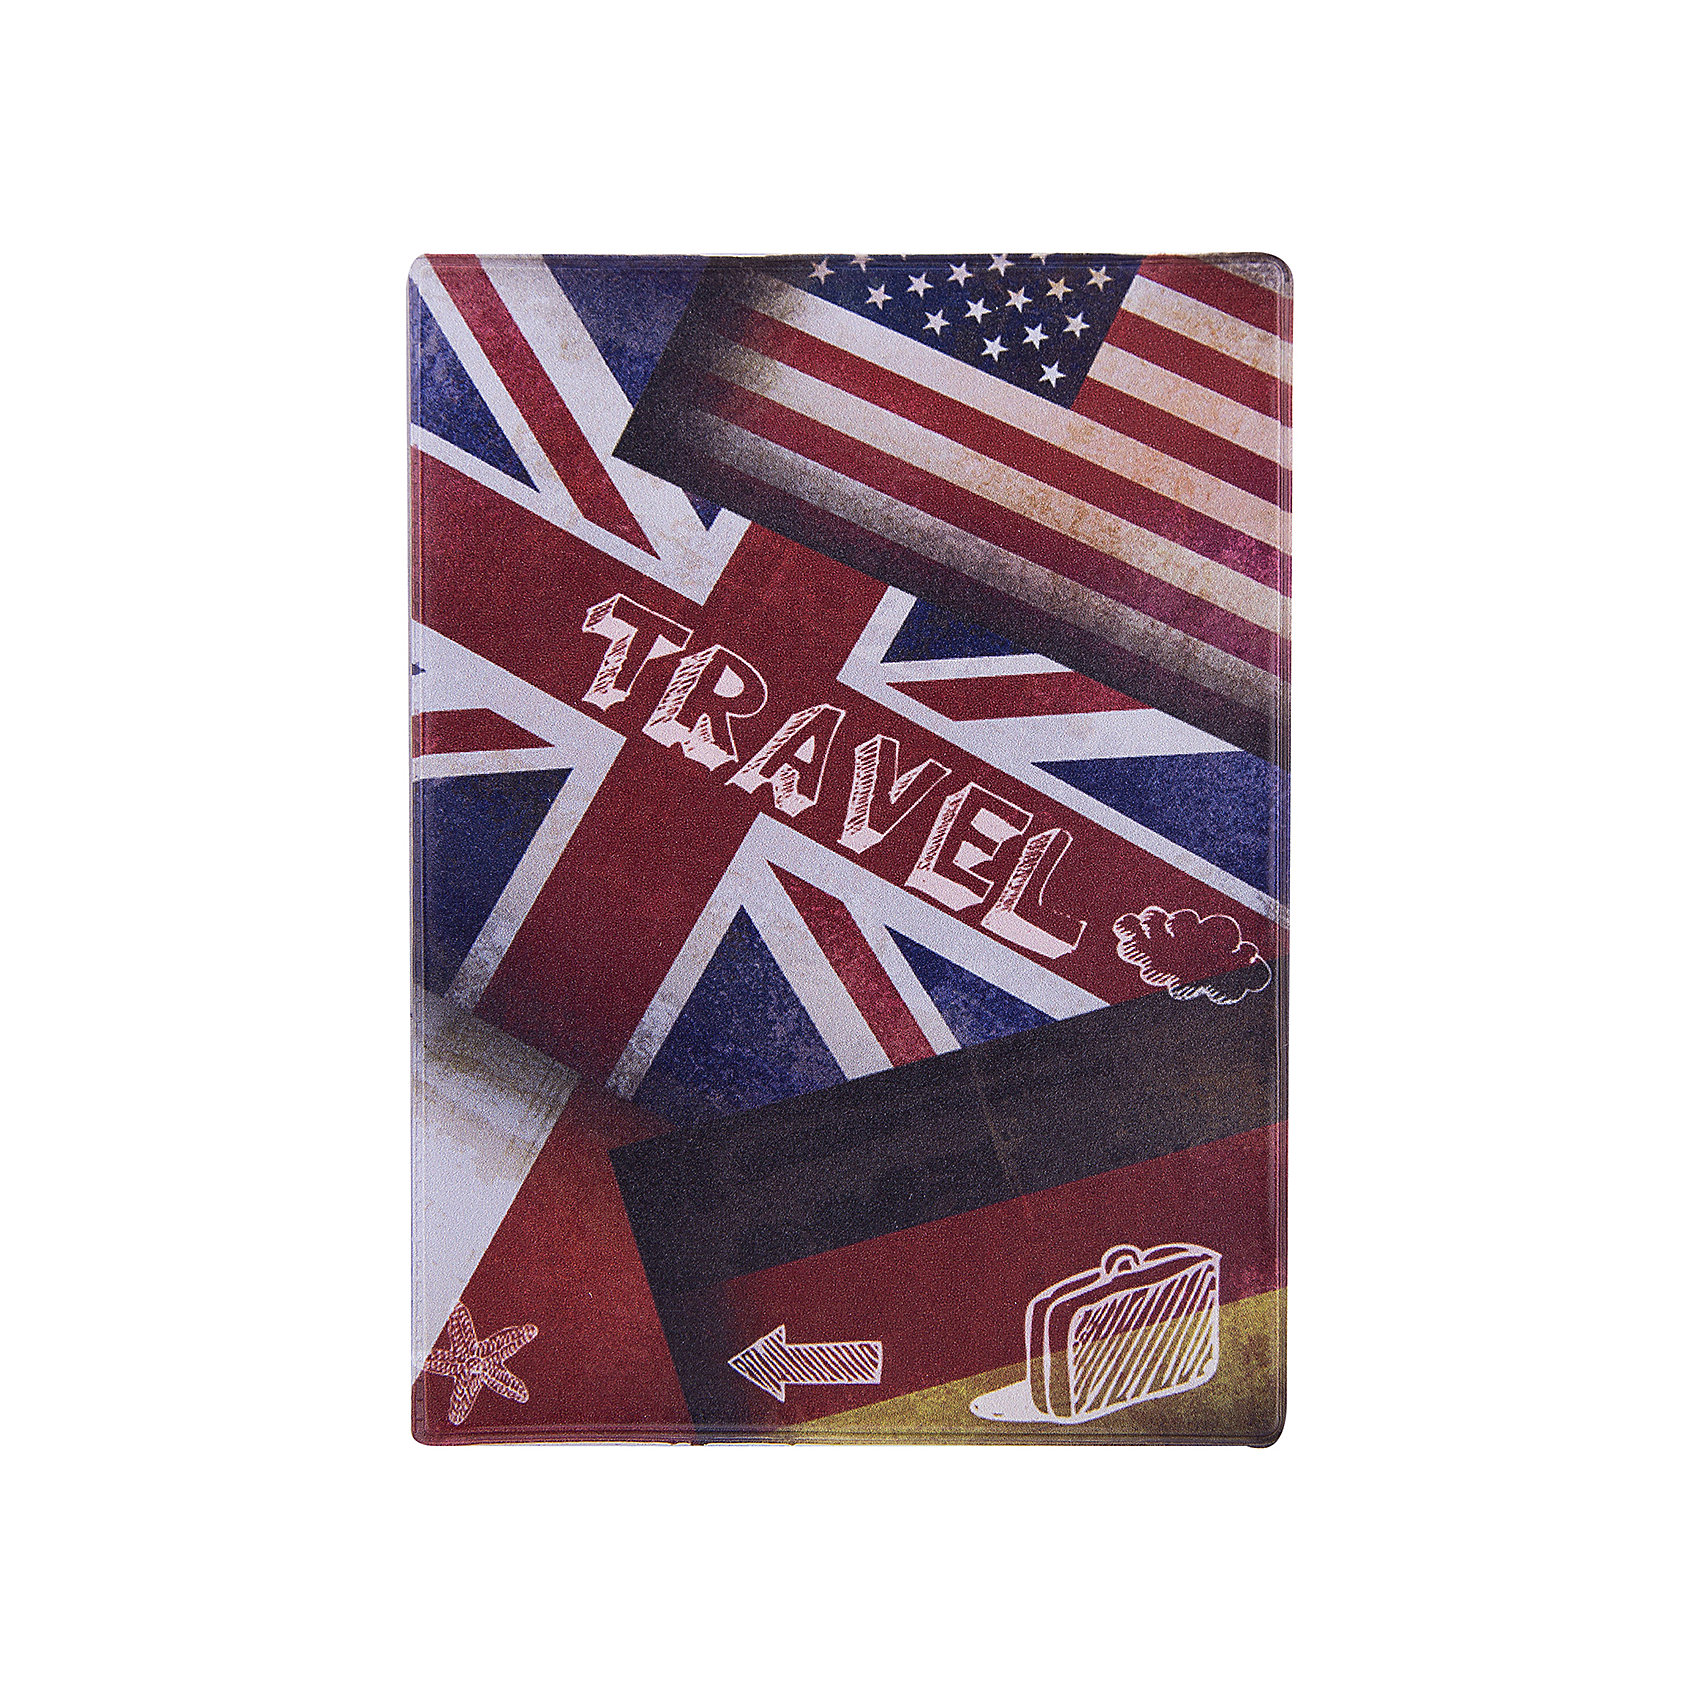 Обложка для паспорта Флаги, Феникс-Презент